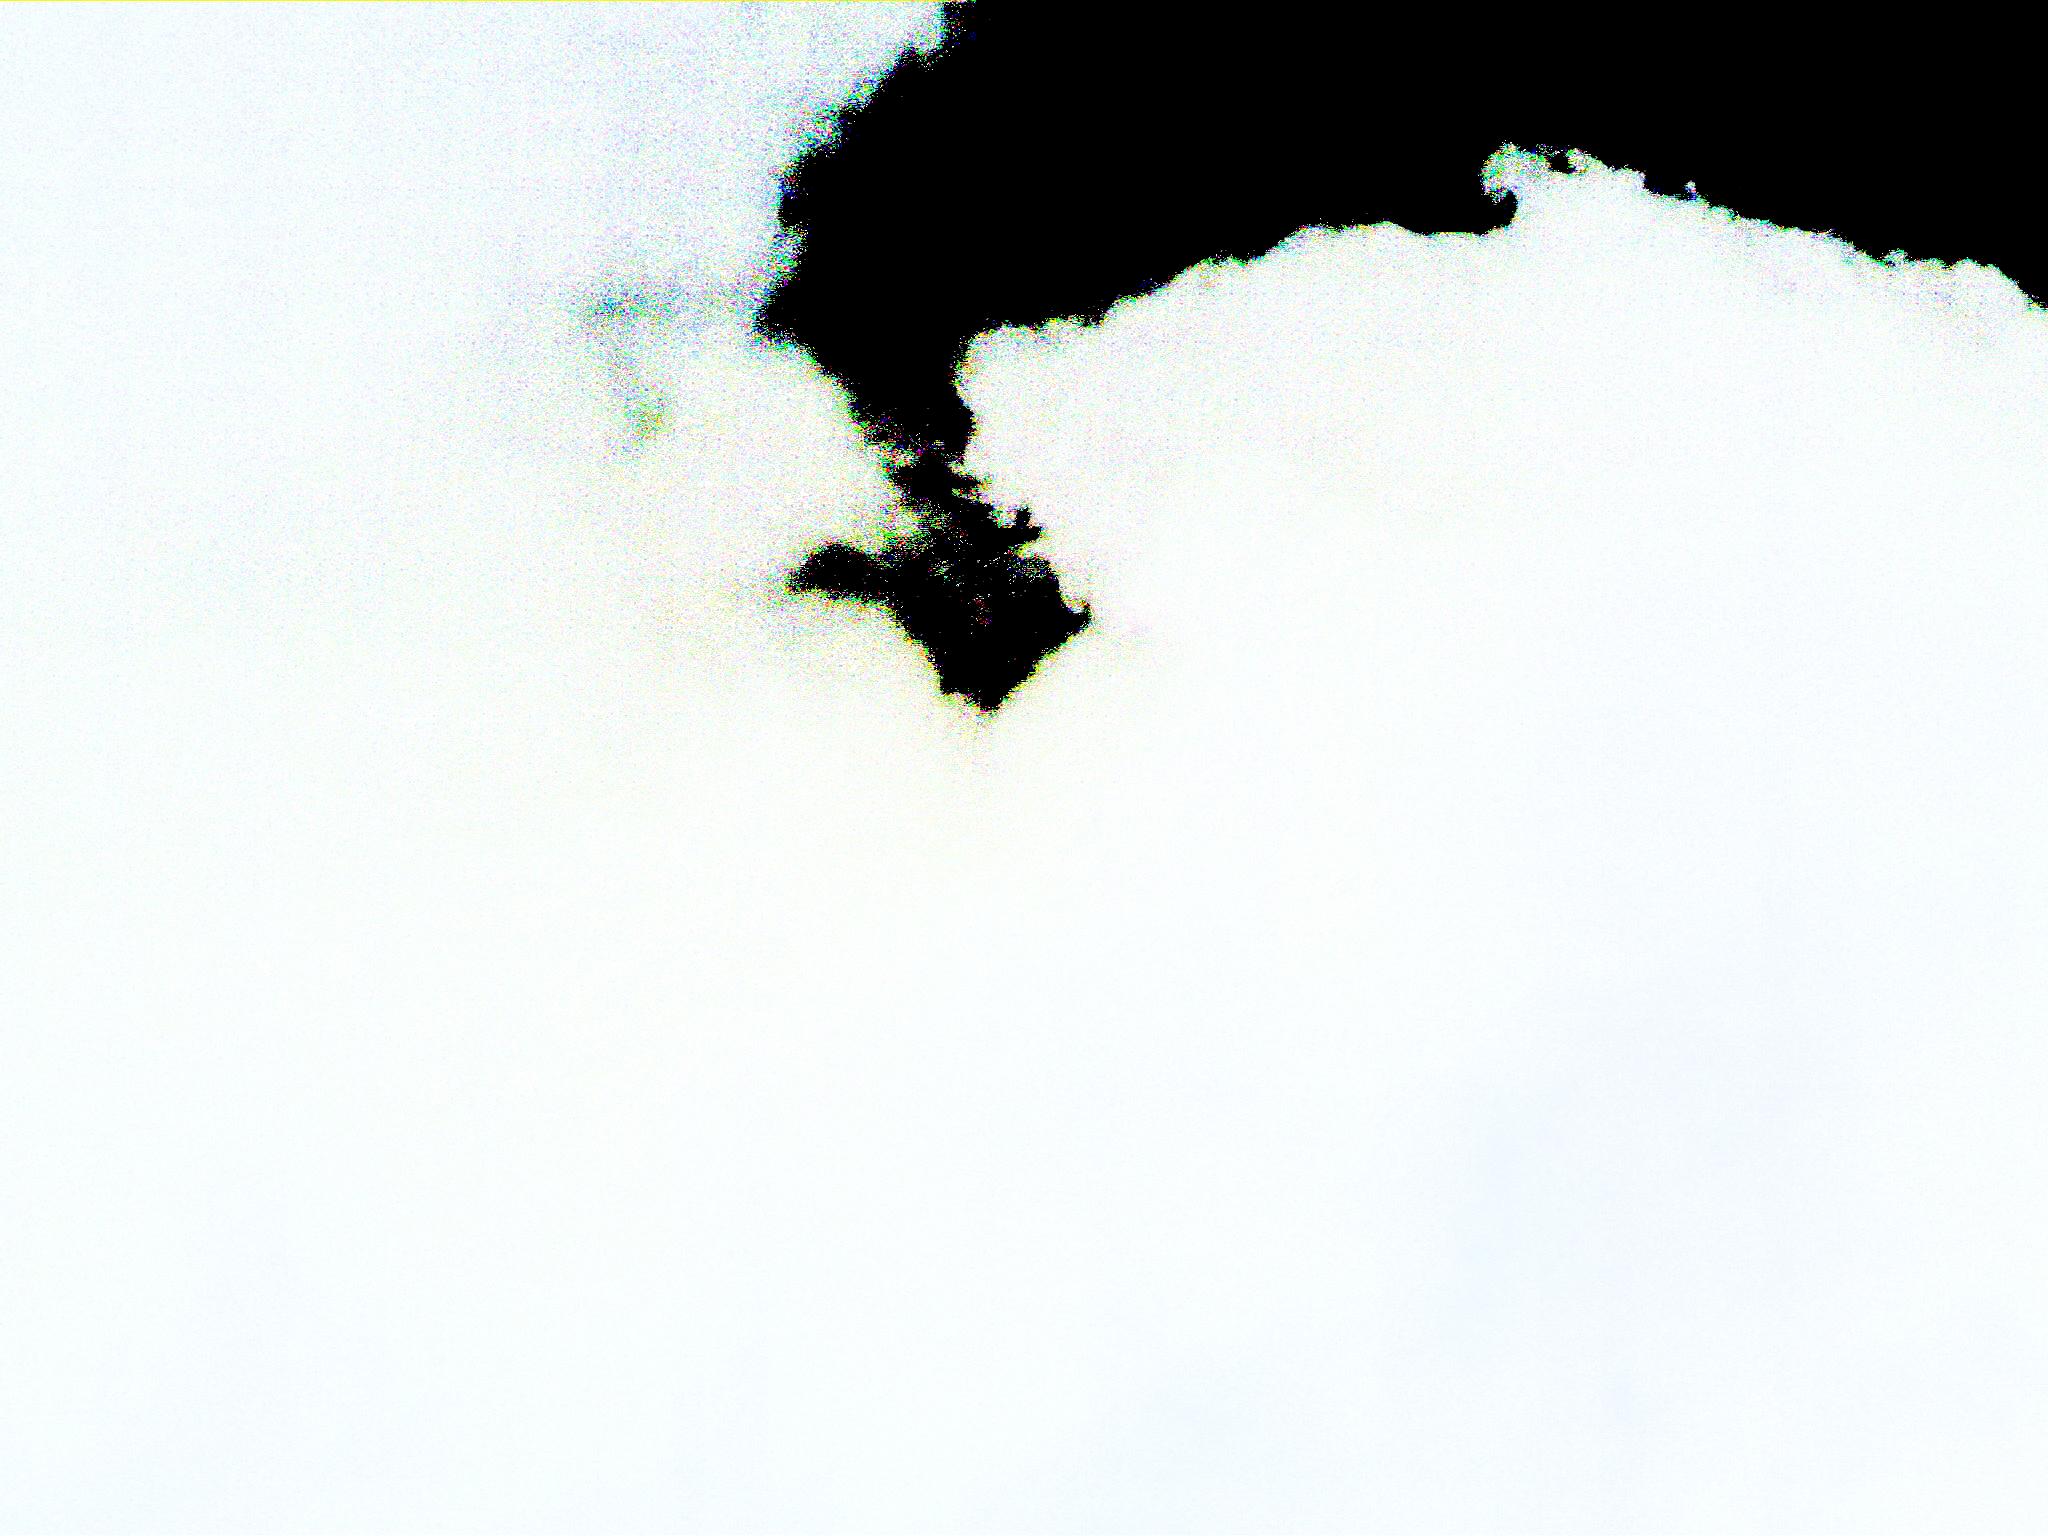 Smoke effect png. Black and white pattern